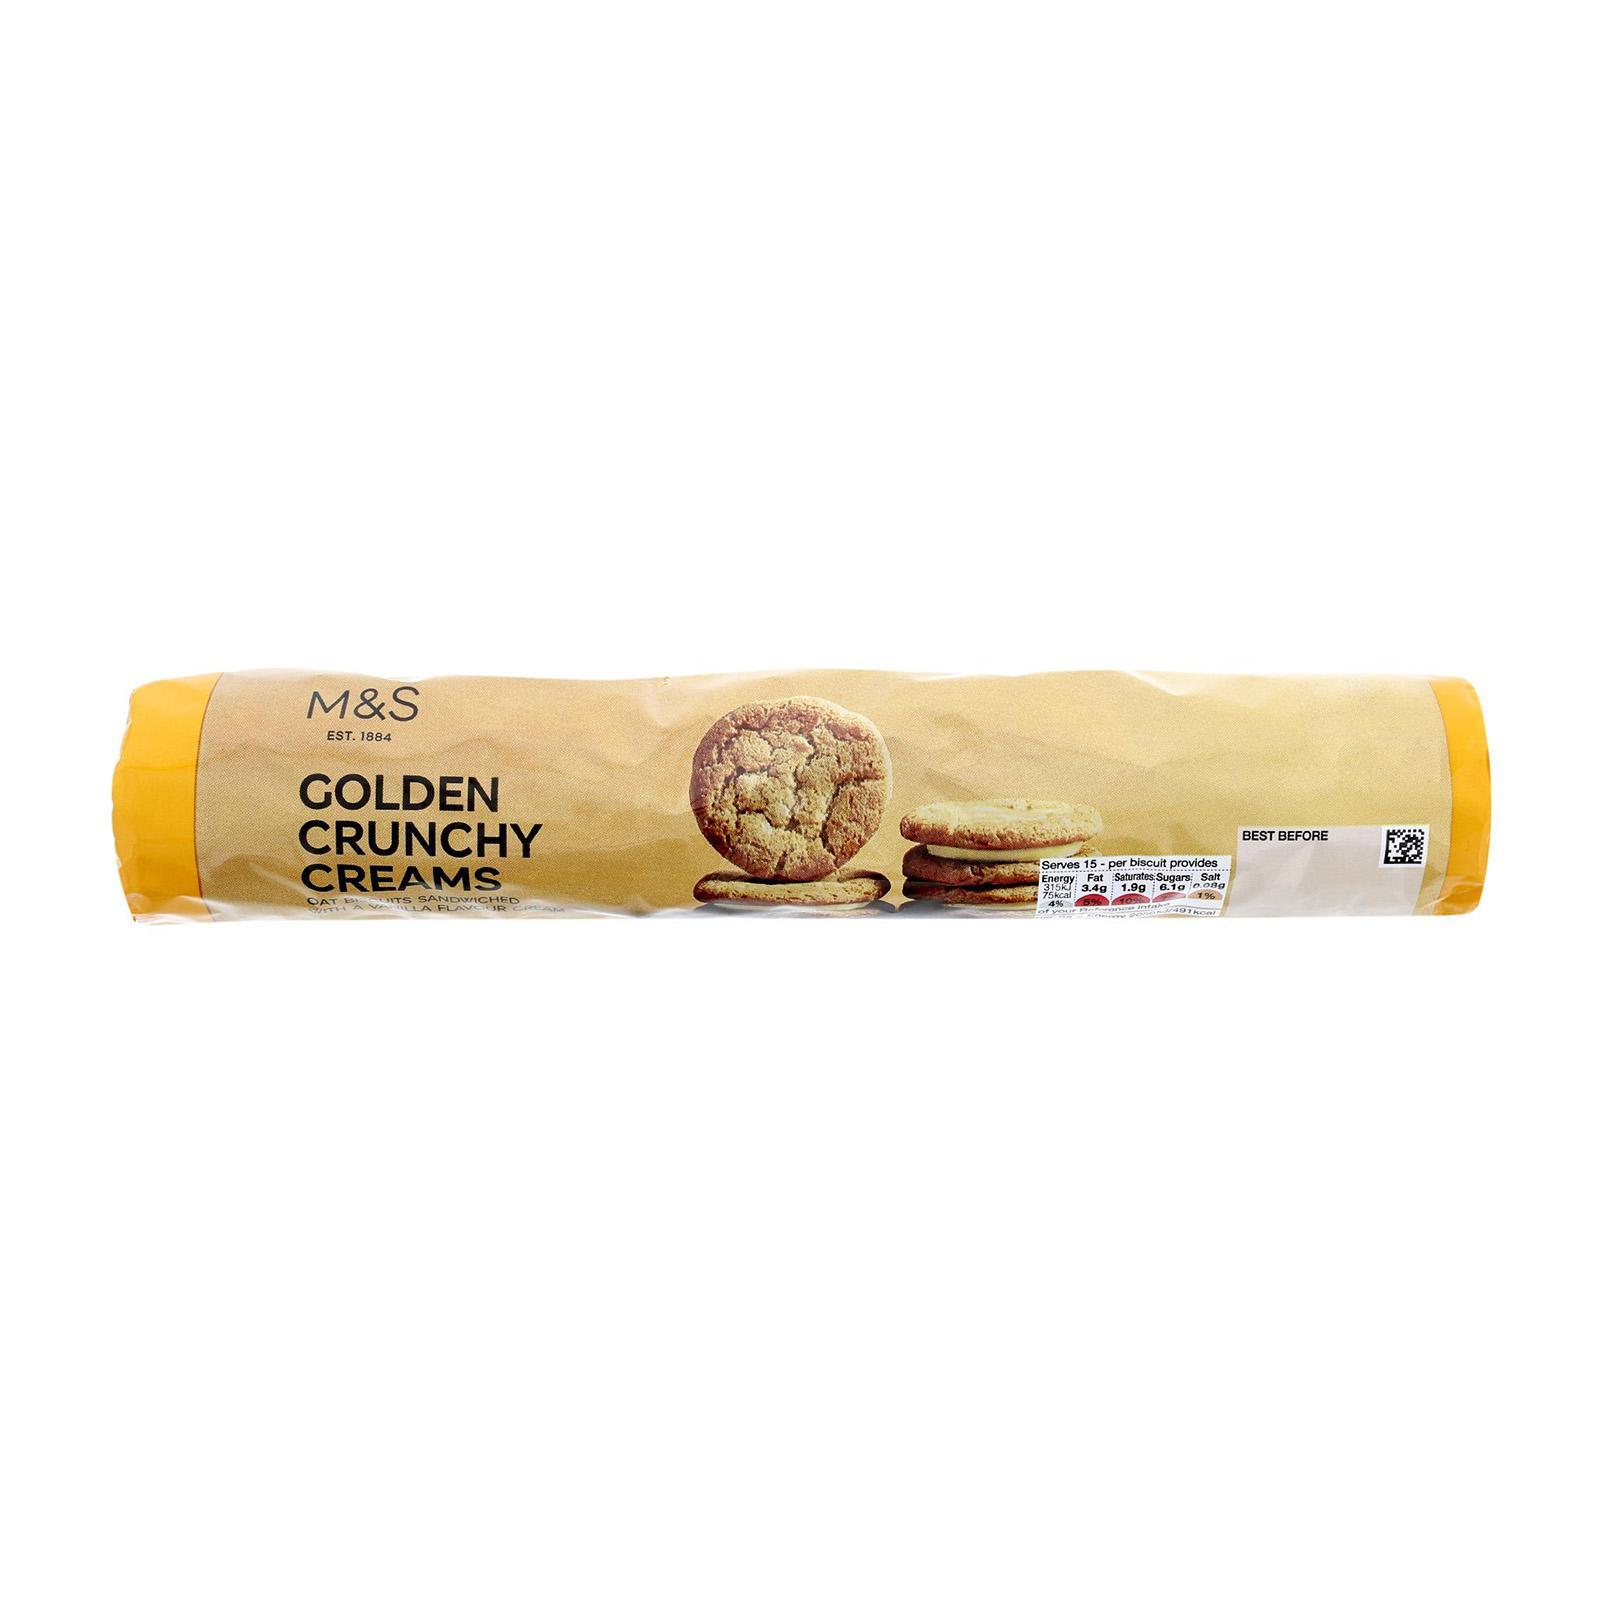 Marks & Spencer Golden Crunchy Creams